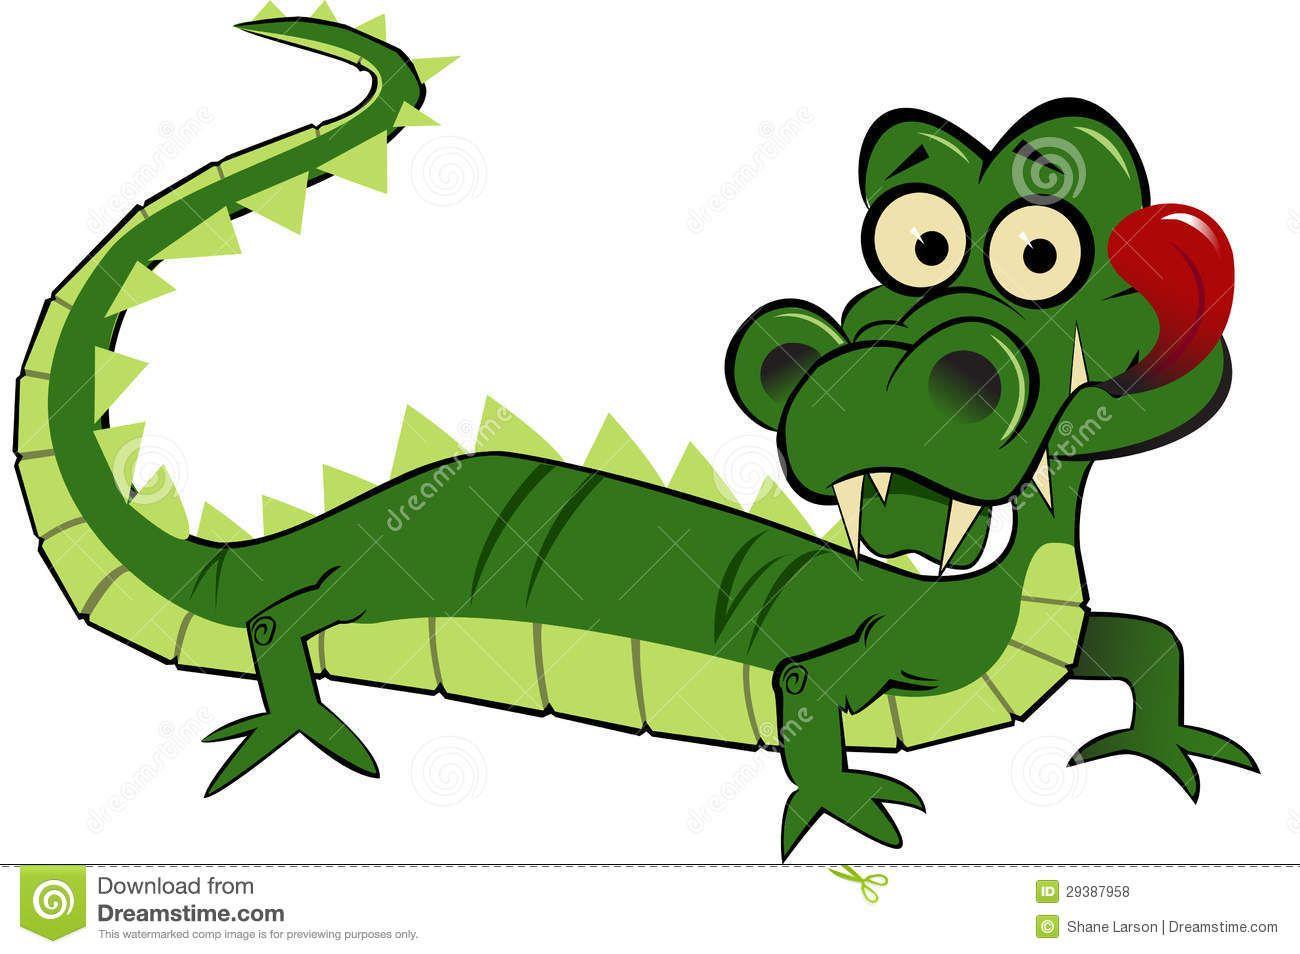 Swamp Alligator Cartoon Clipart Free Clip Art Images Illustraties Illustratie Poster